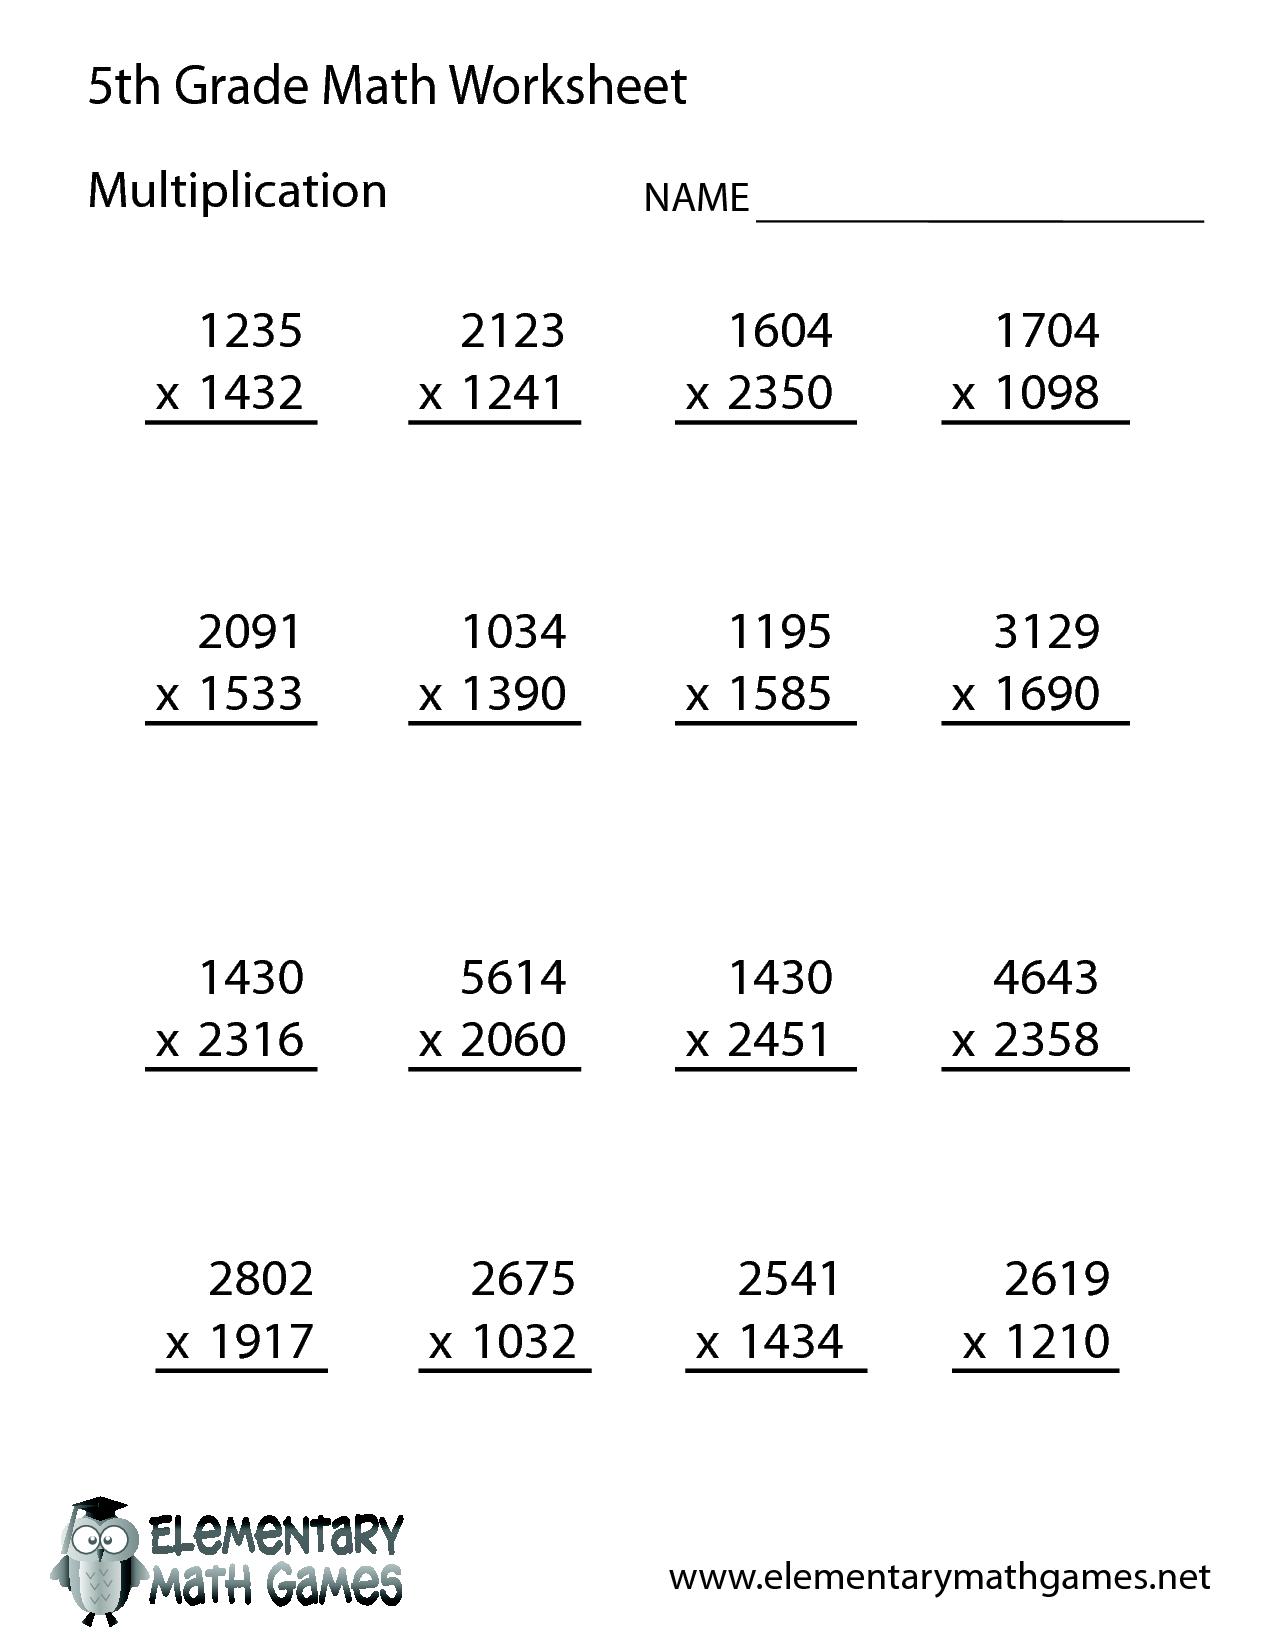 hight resolution of 5th Grade Math Worksheets   5th Grade Math Worksheet   5th grade worksheets